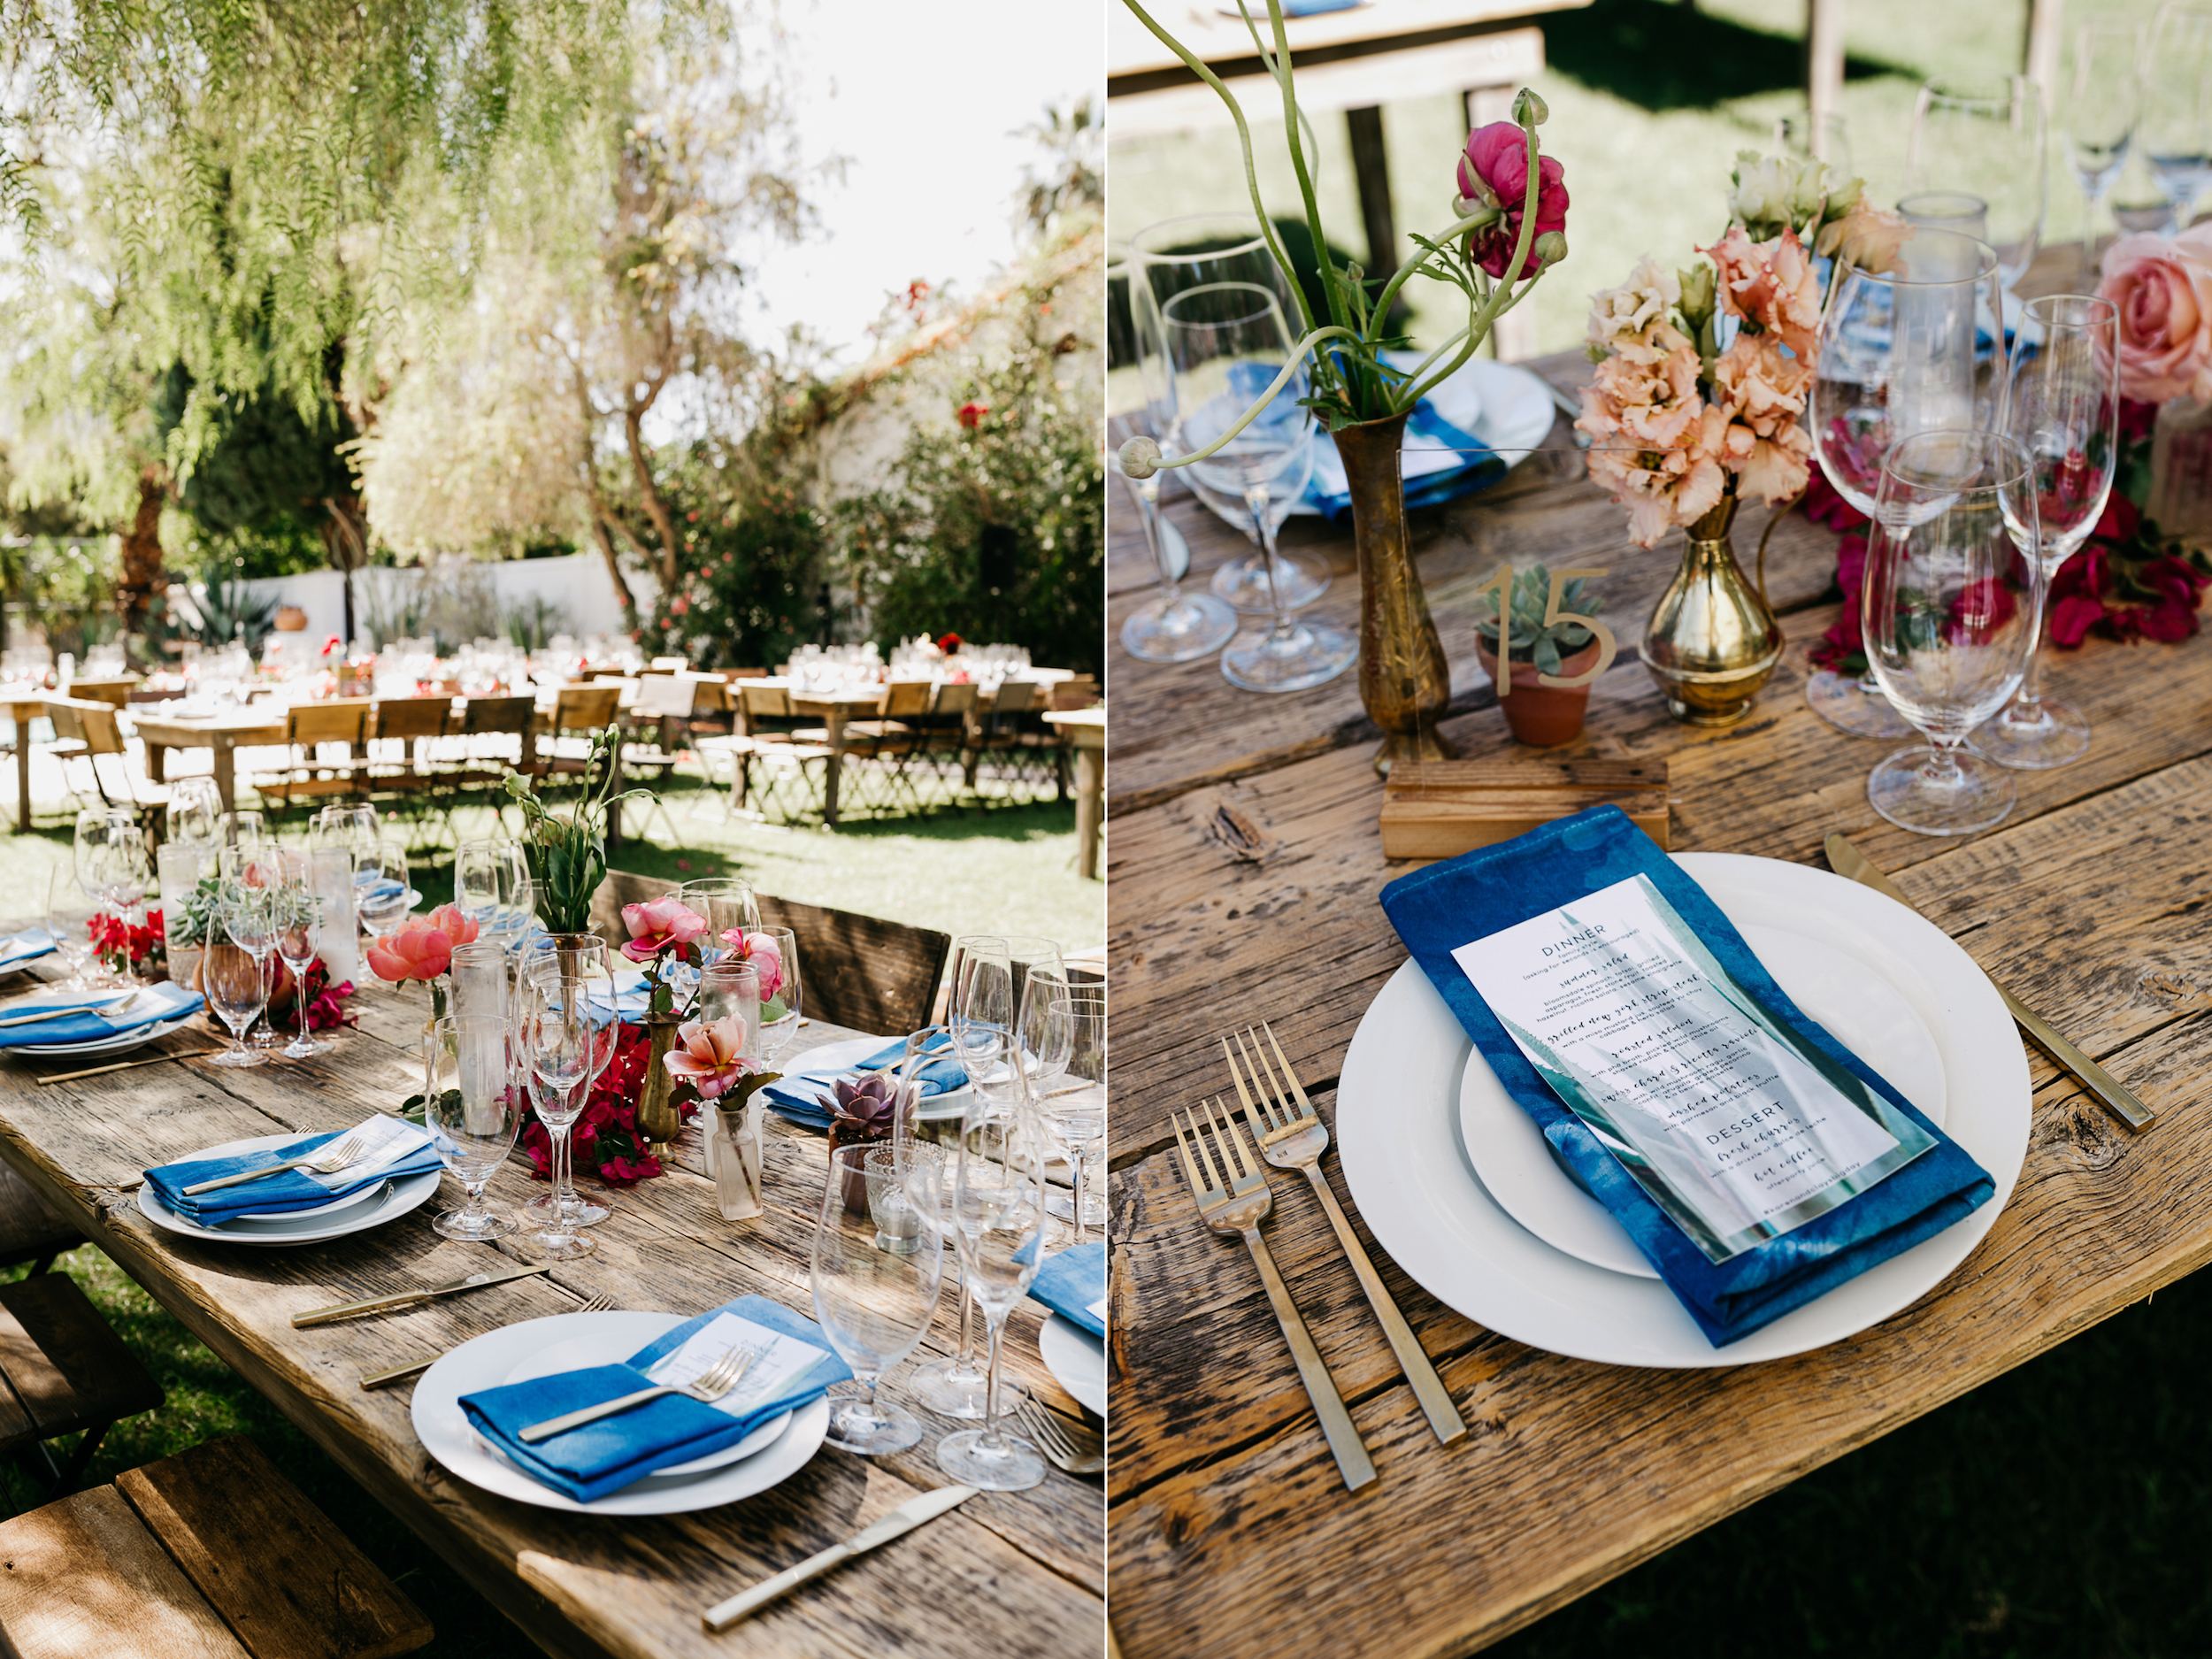 palm-springs-wedding-photographer 25.jpg